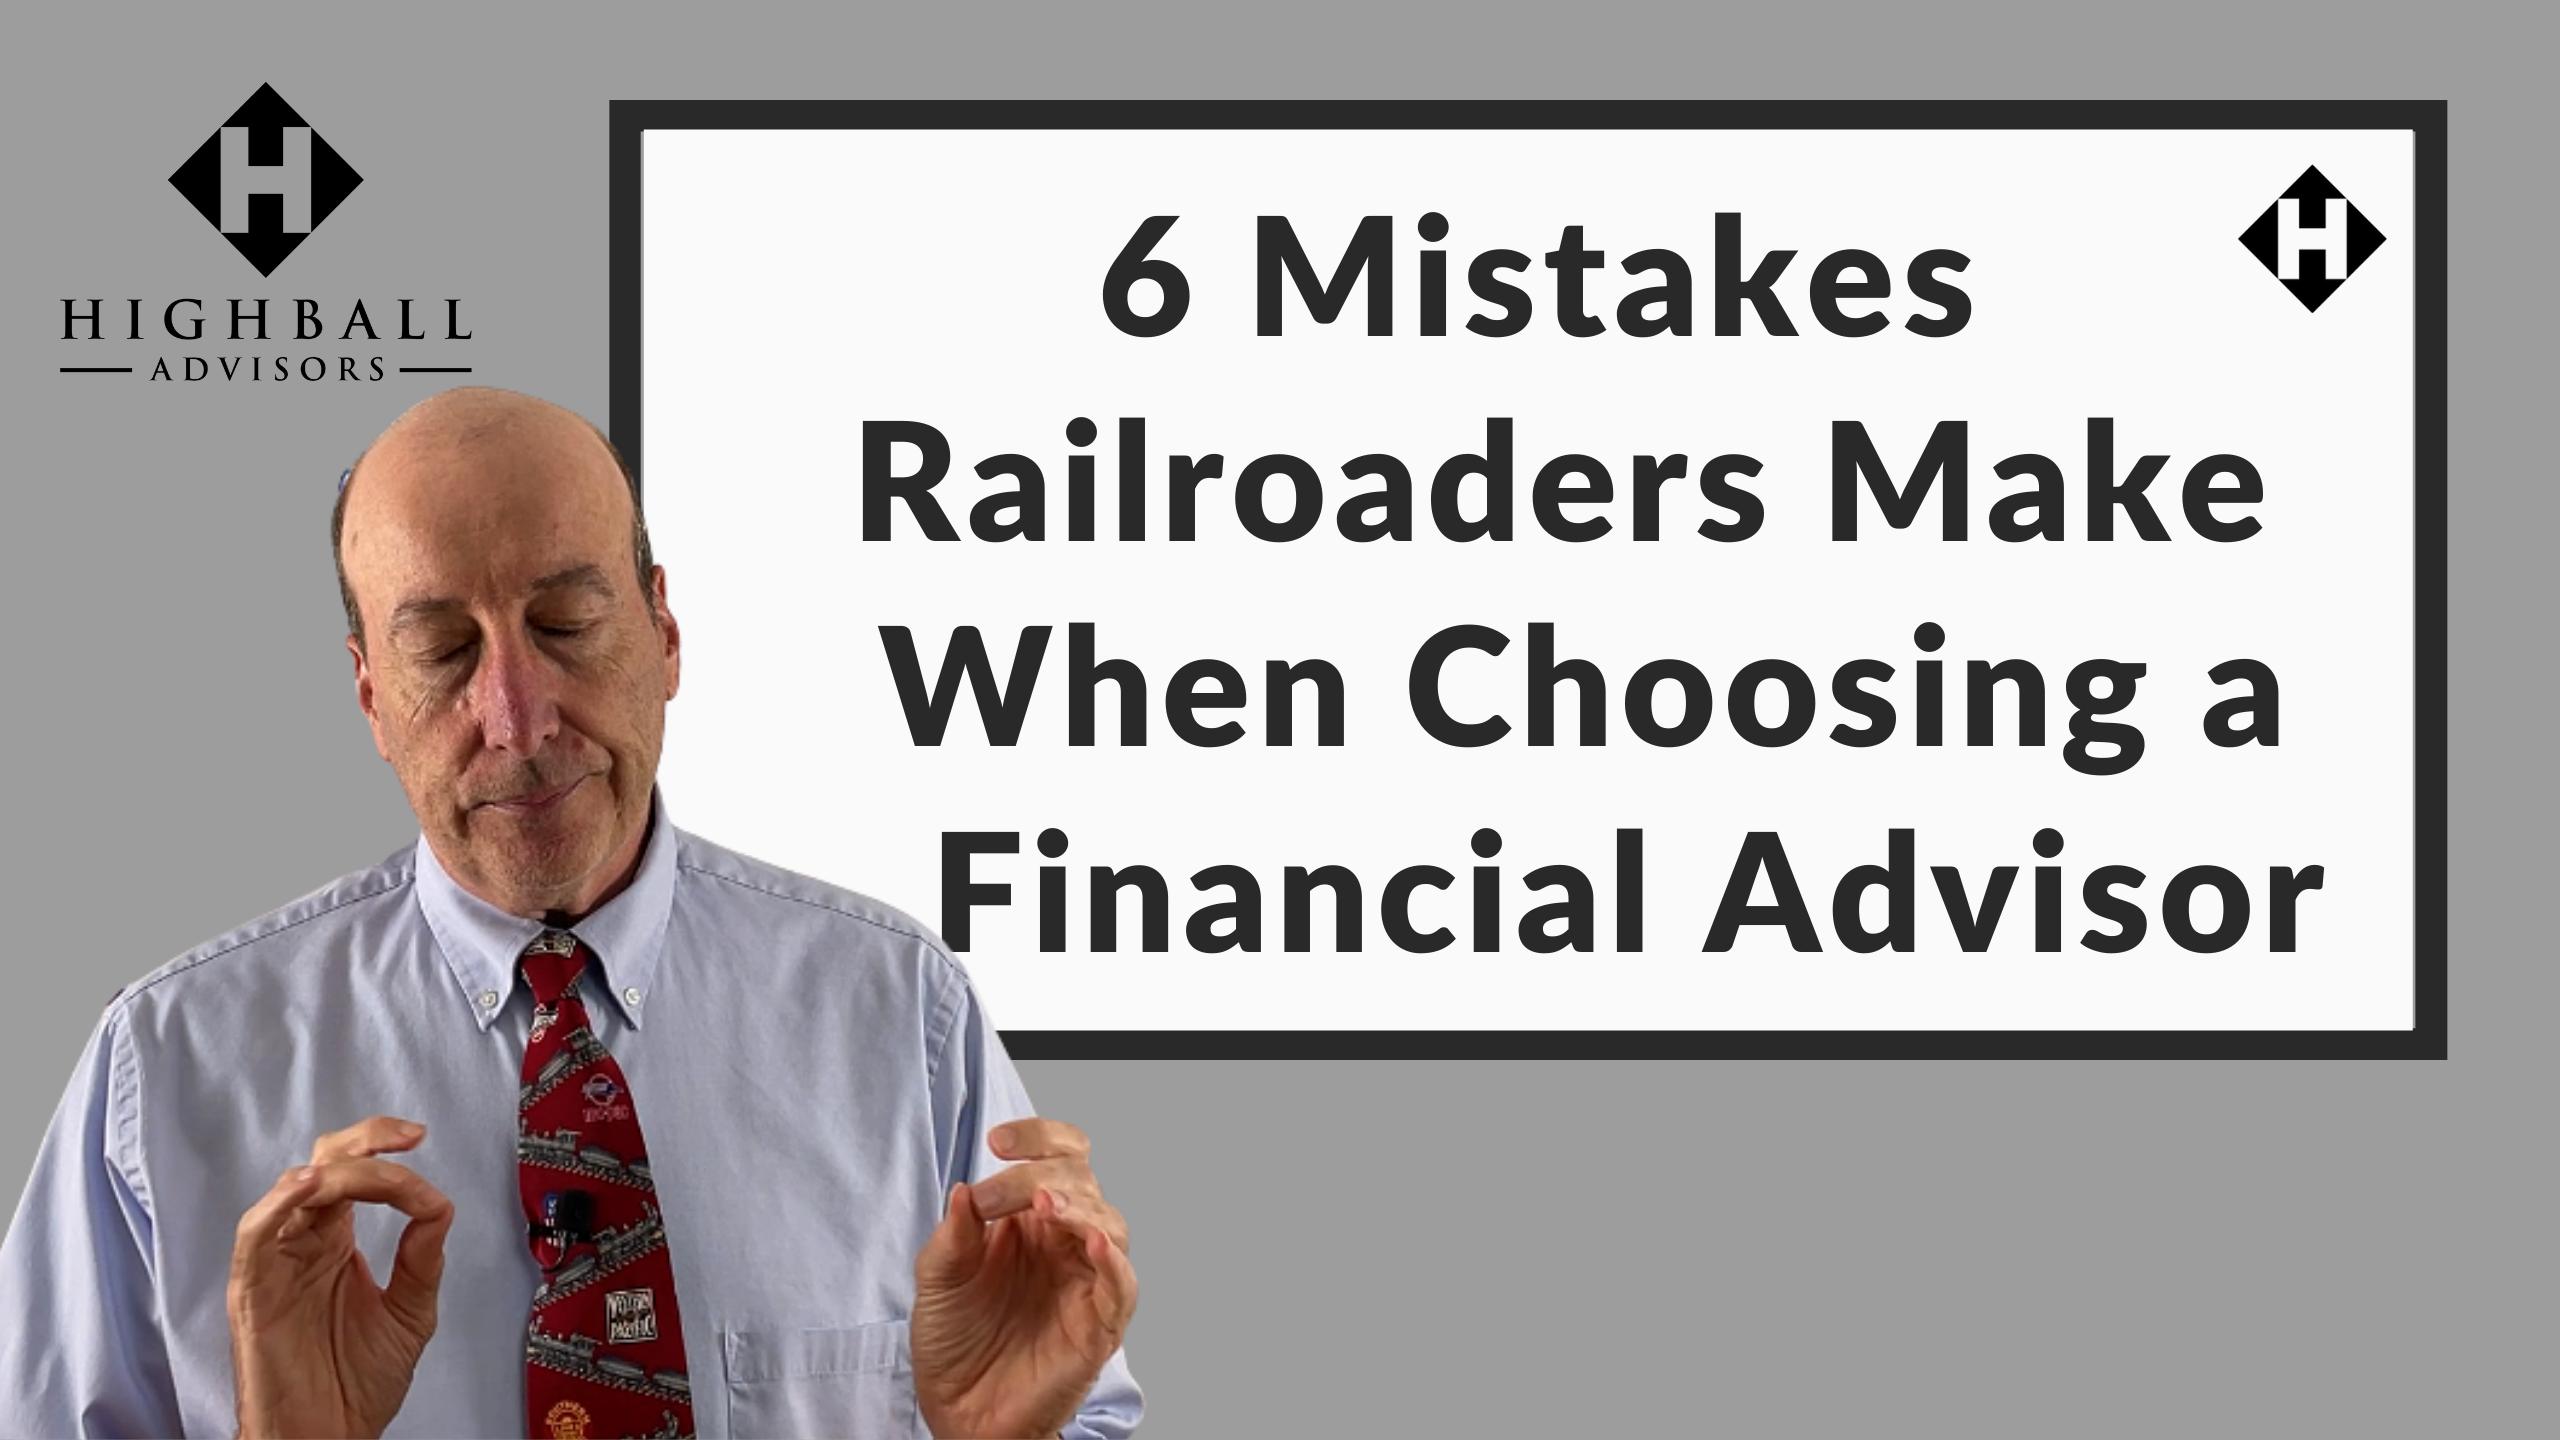 6 Mistakes Railroaders Make When Choosing a Financial Advisors Thumbnail